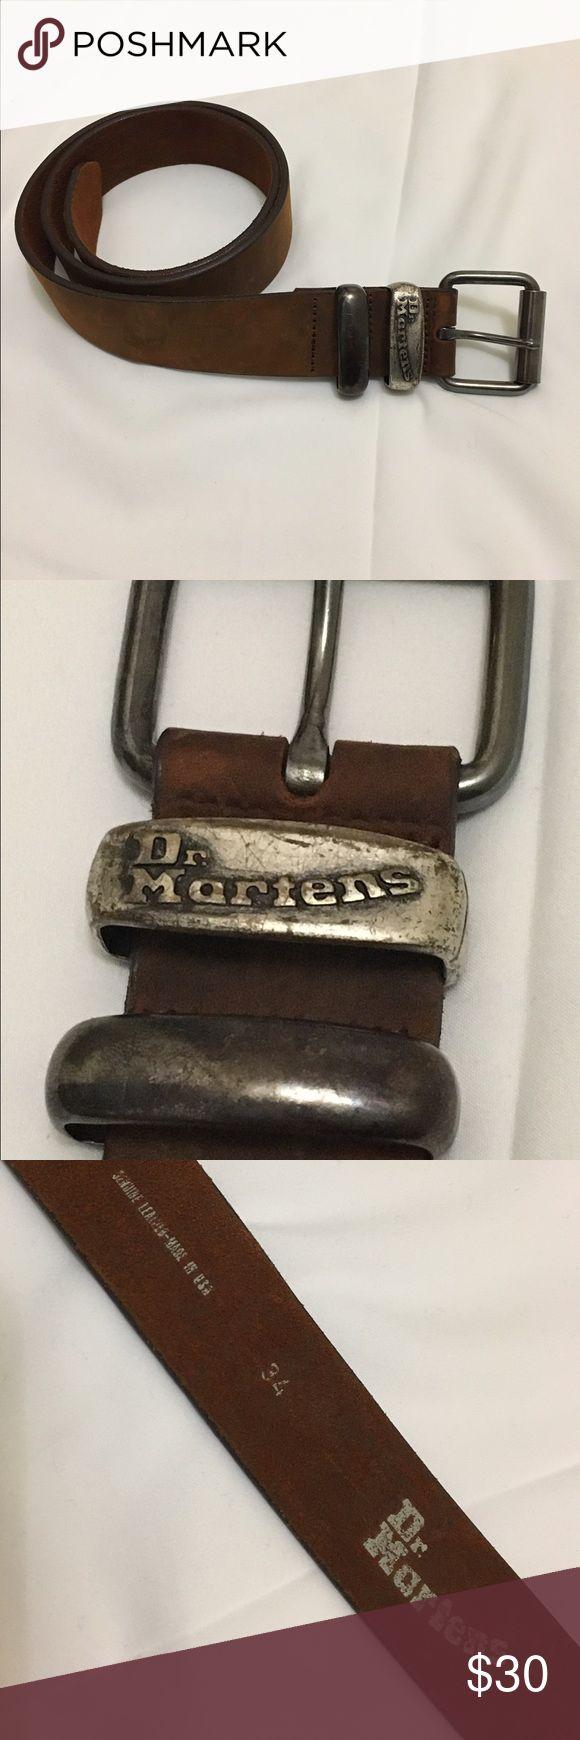 Dr Martens brown leather men belt Size 34 waist Dr Martens Accessories Belts